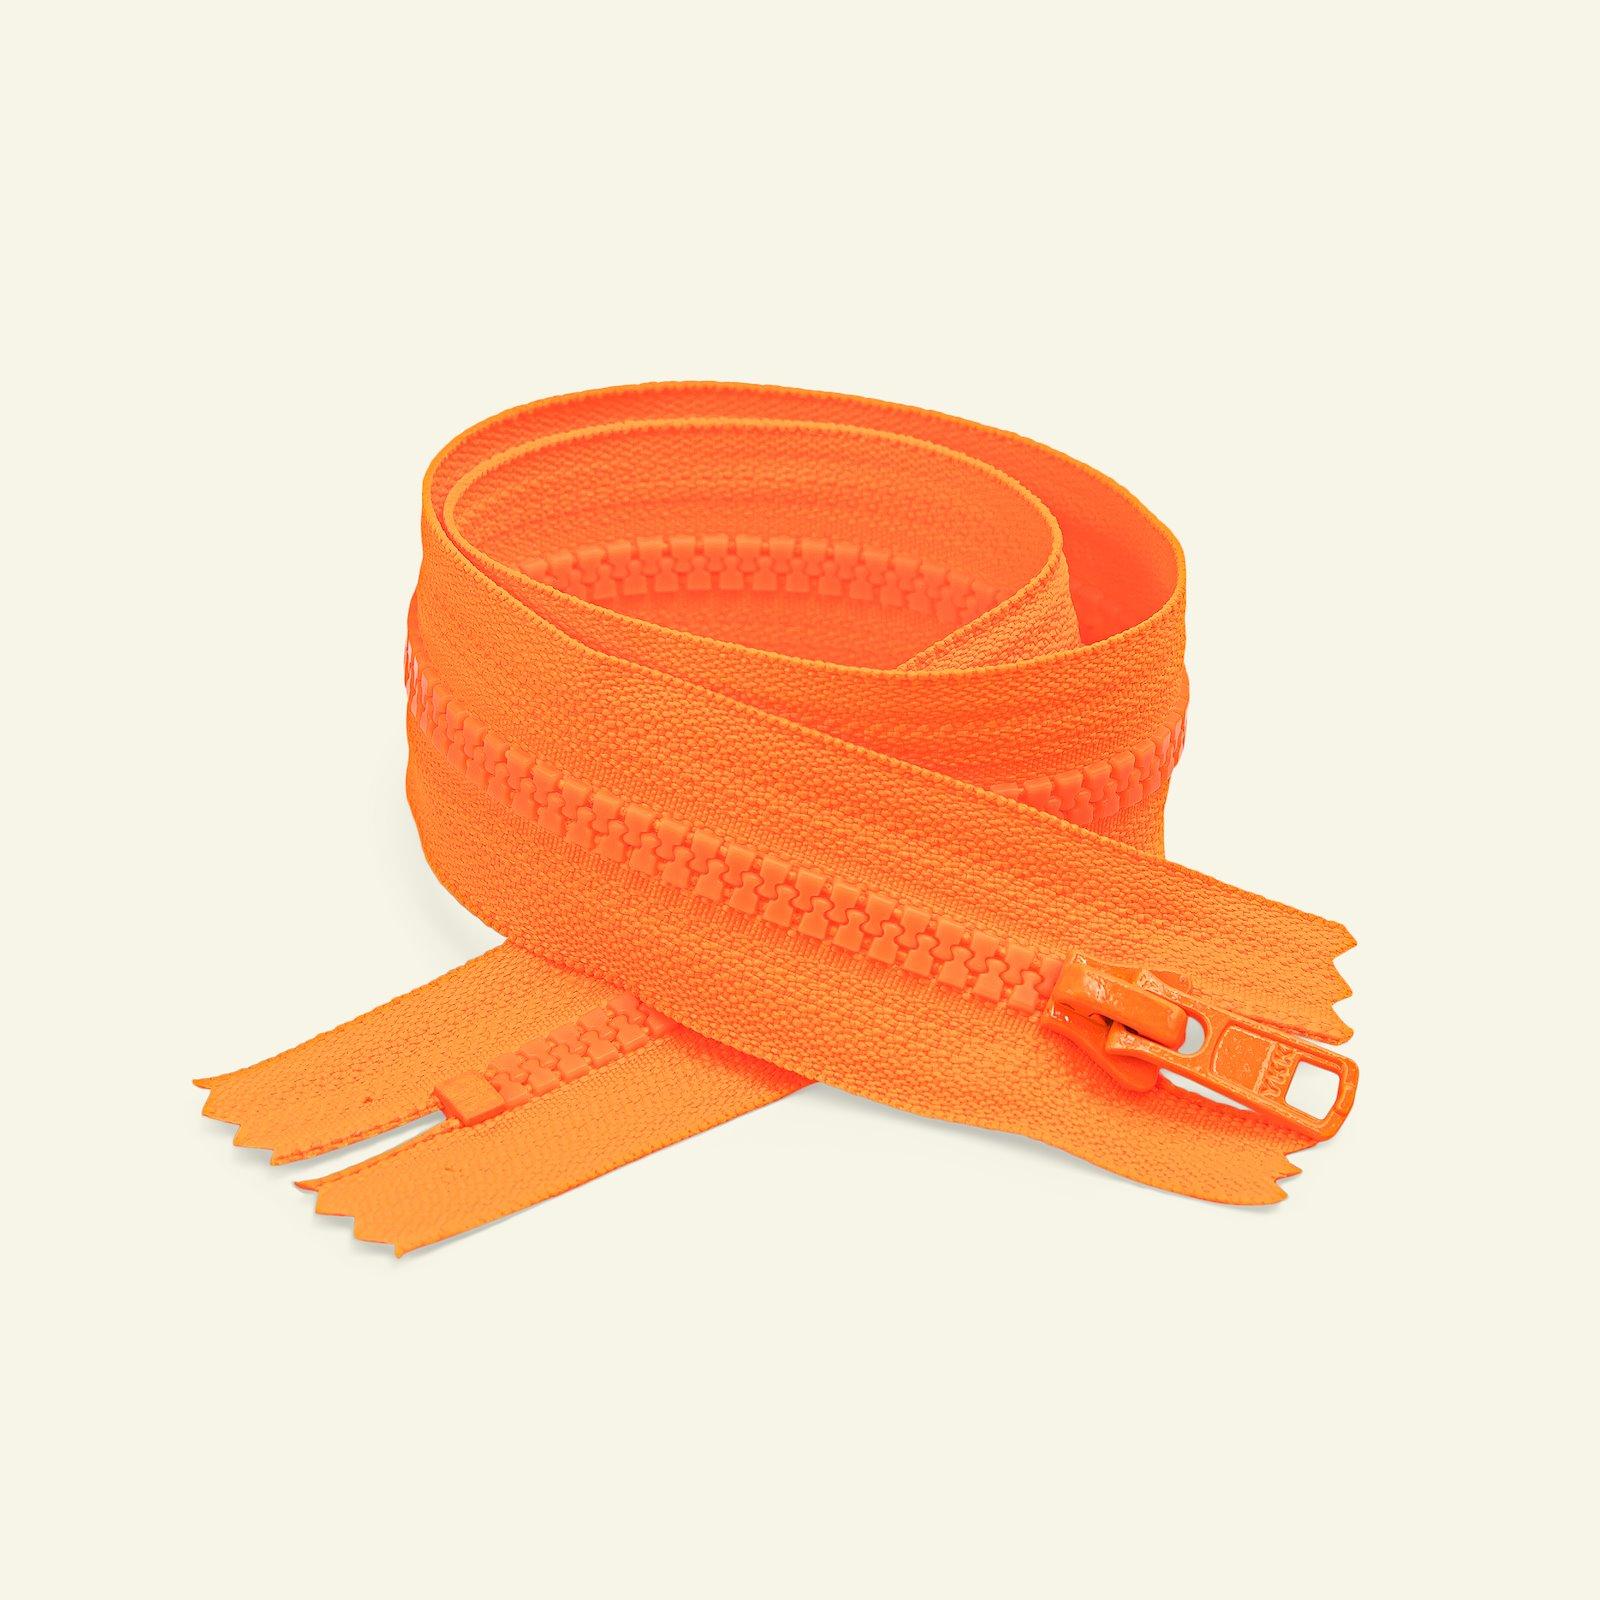 YKK zip 6mm closed end 20cm neon orange x50185_pack